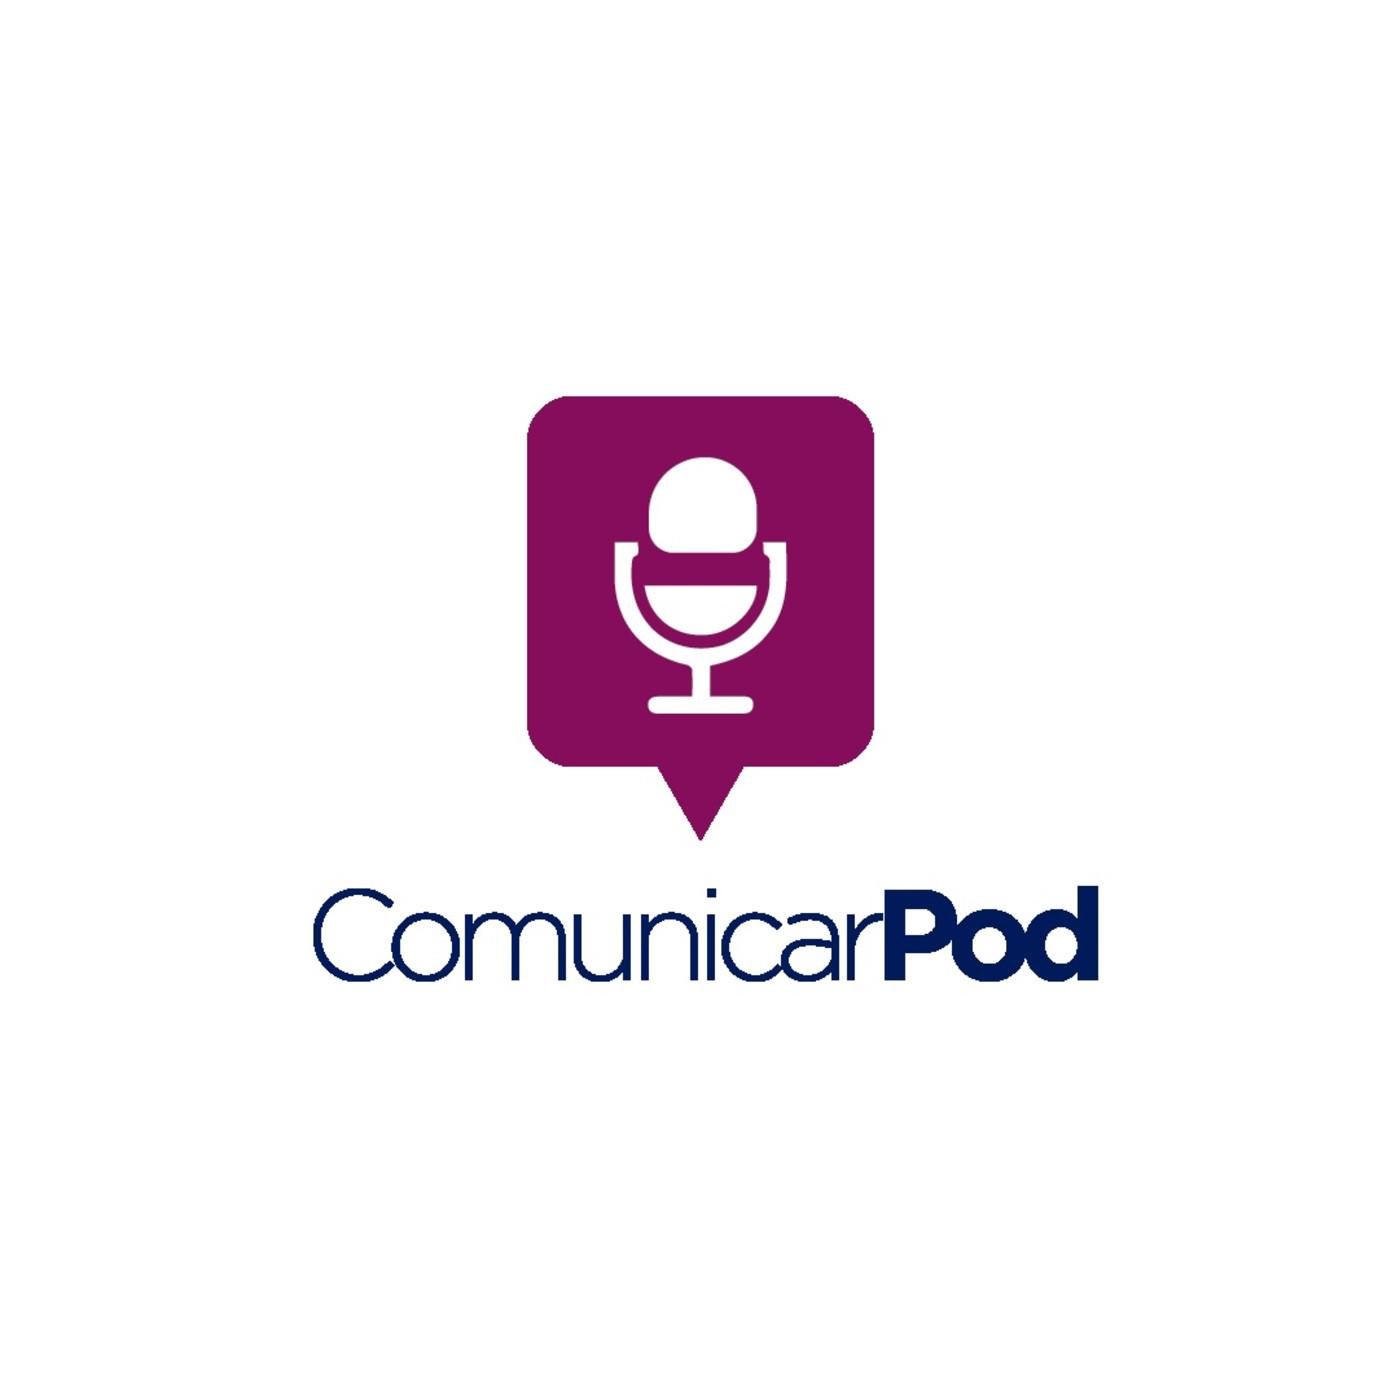 ComunicarPod